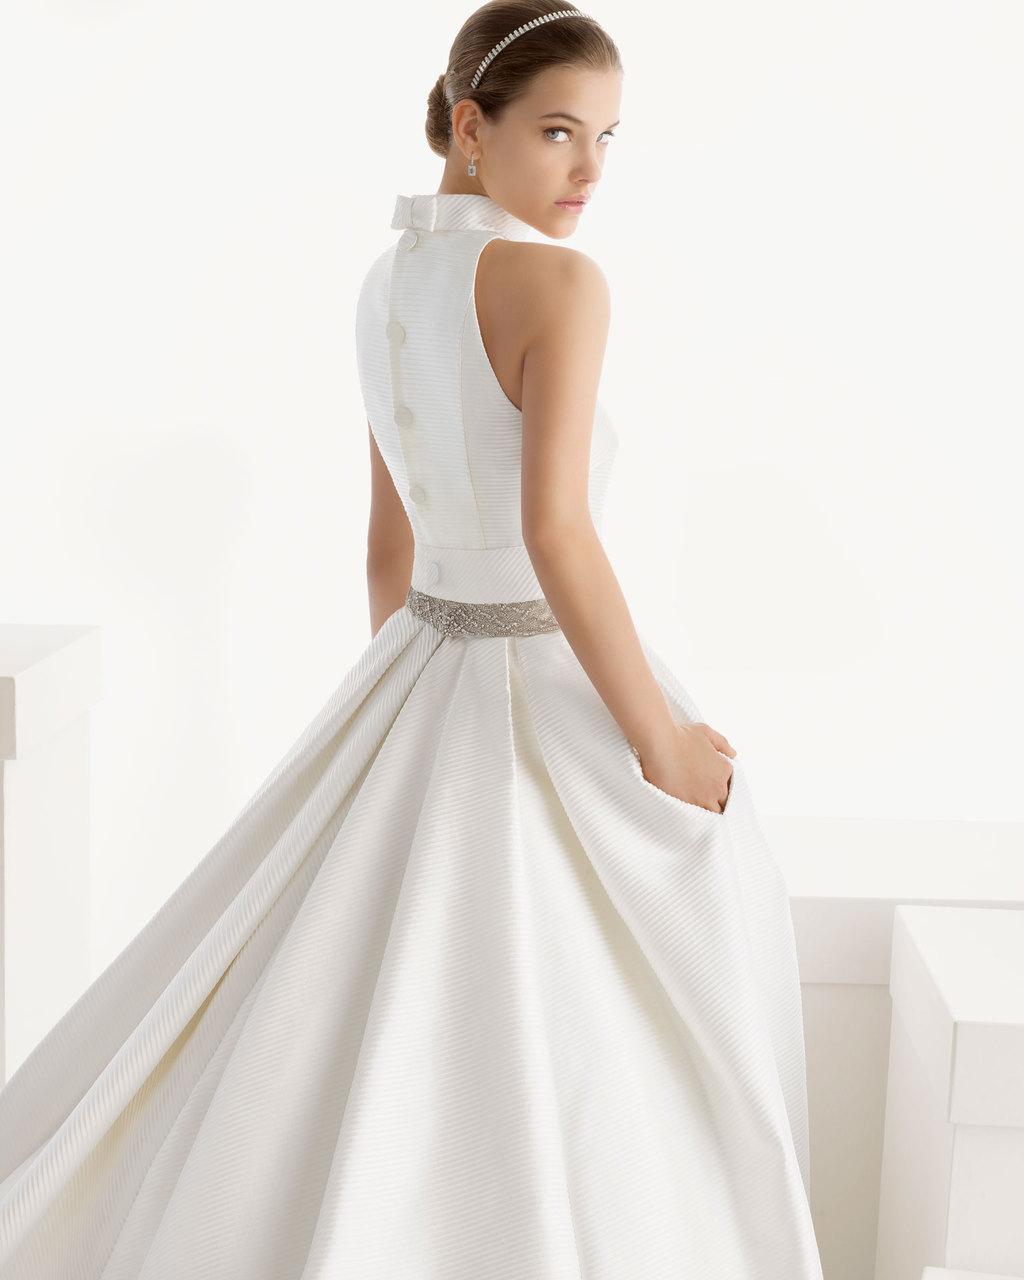 Transforming-wedding-dresses-2013-bridal-gown-by-rosa-clara-5.full